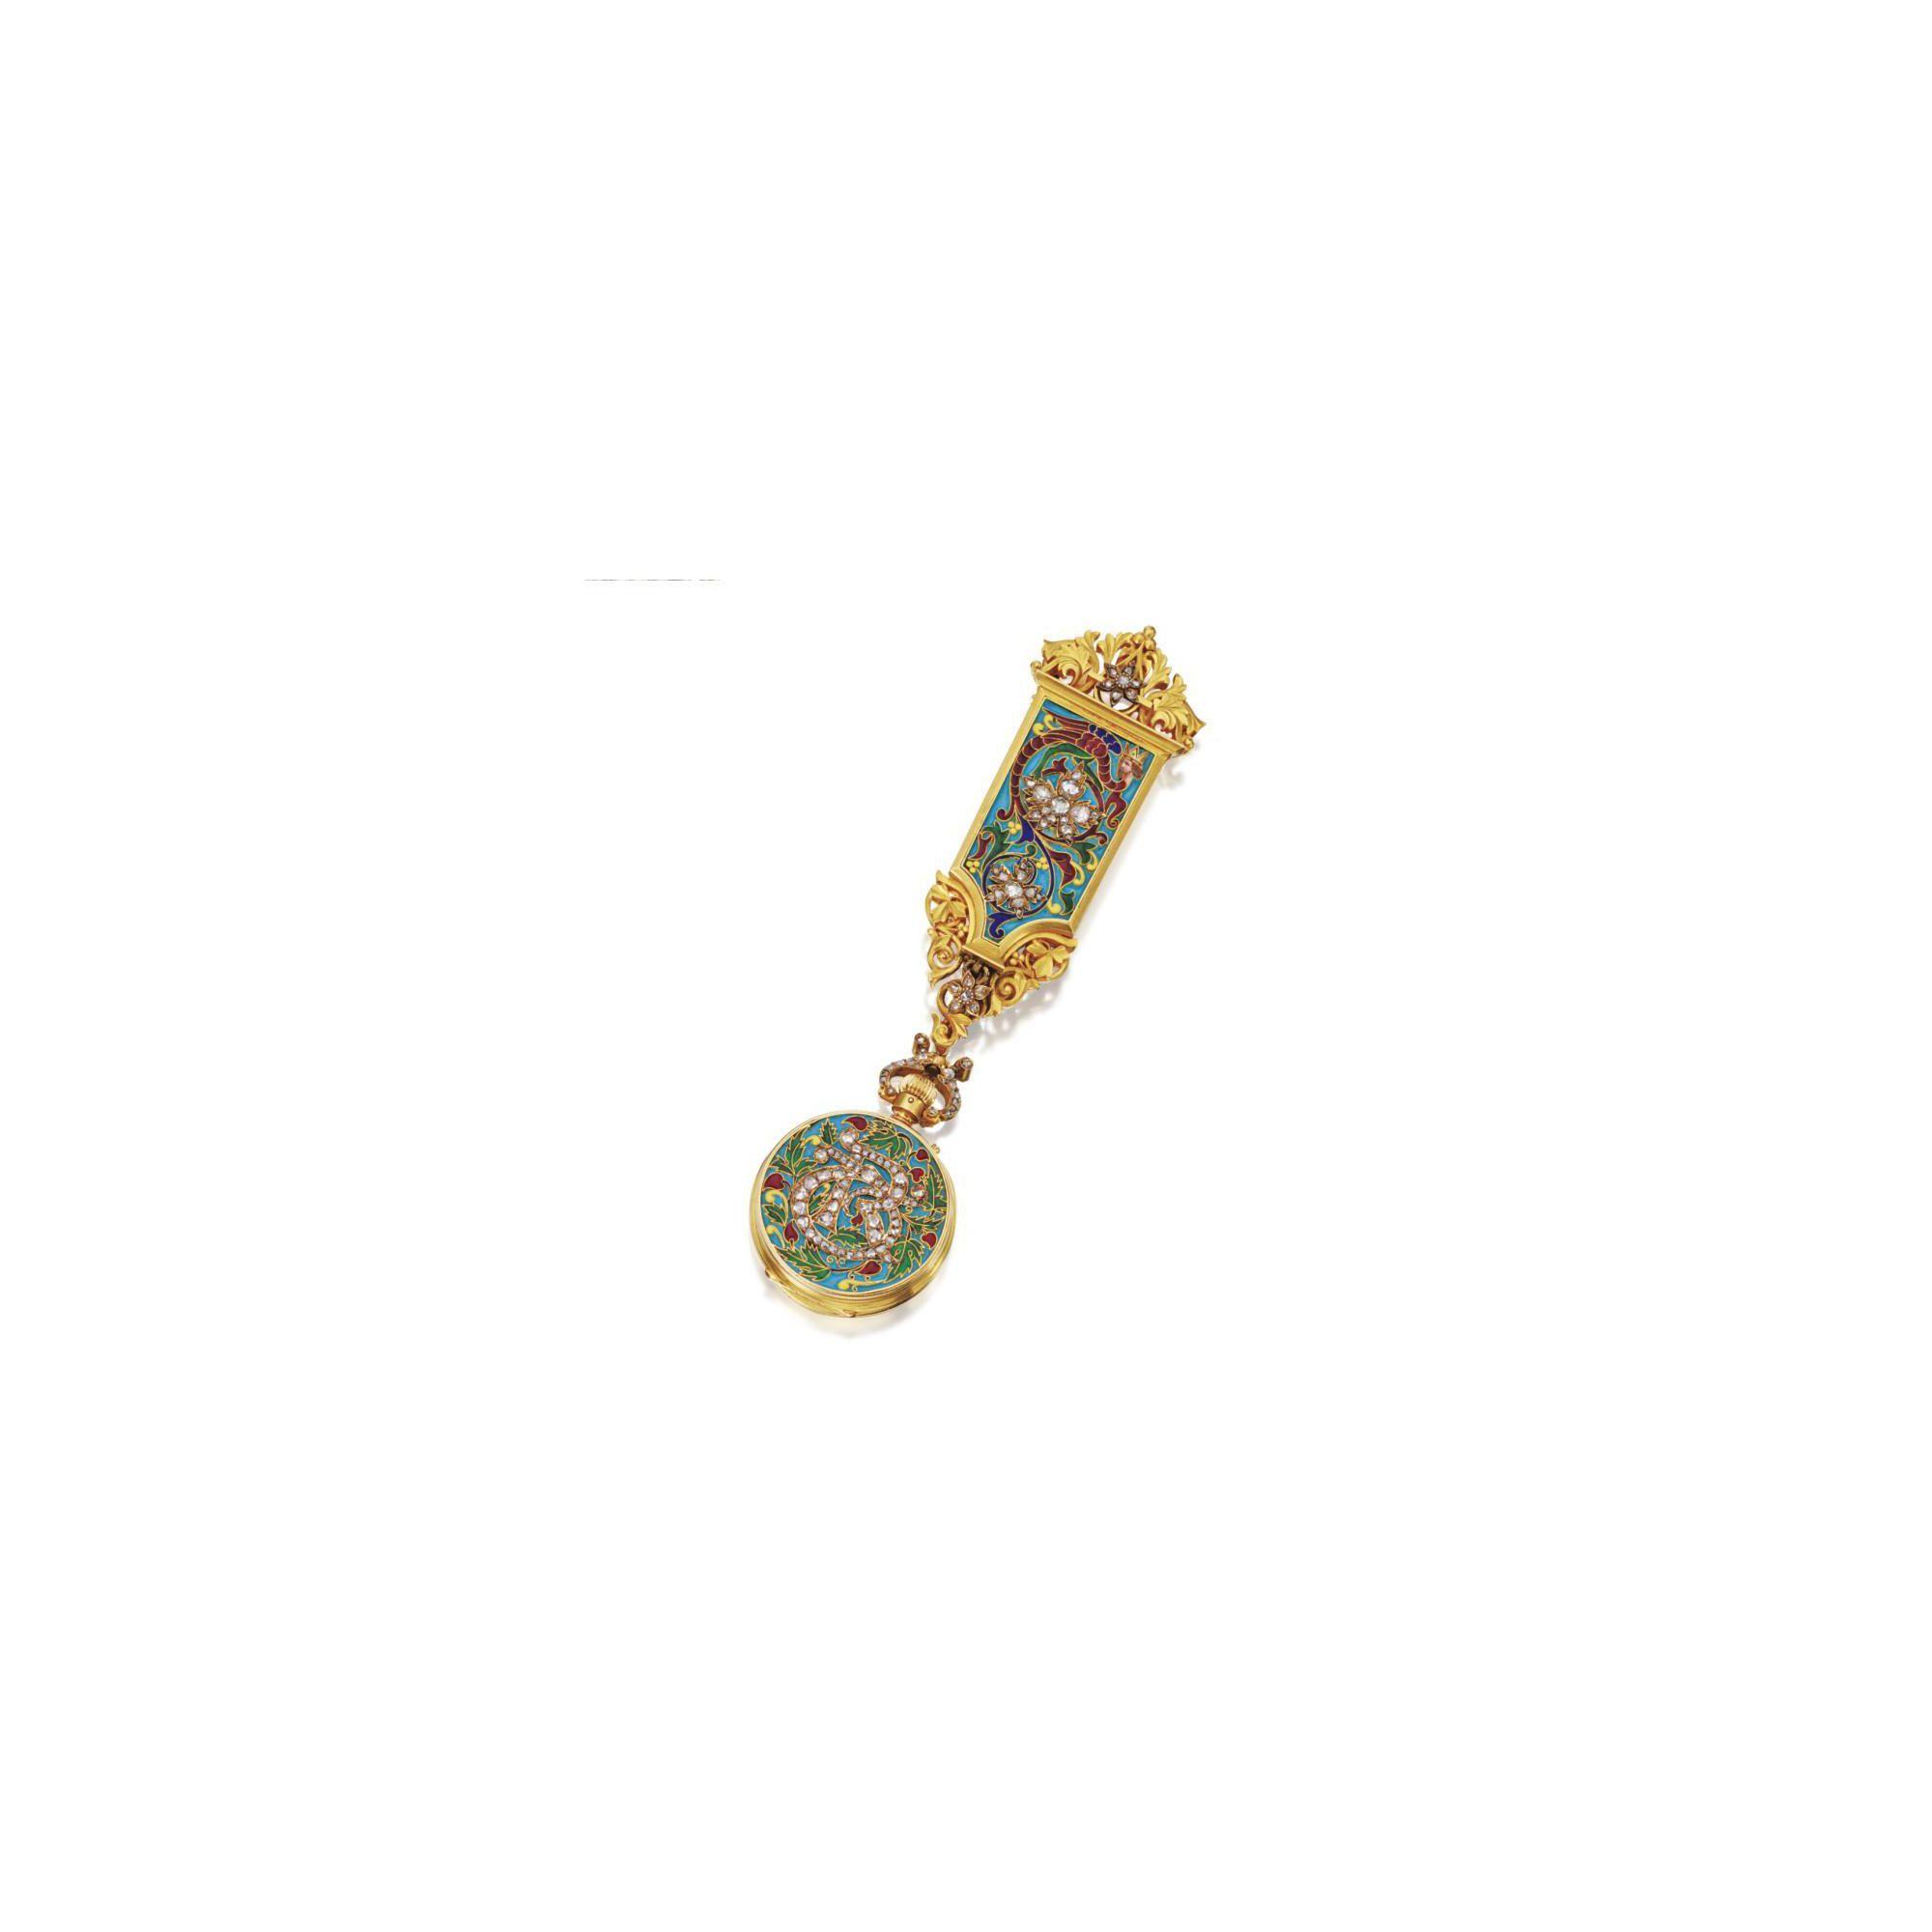 Gold, silver, enamel and diamond pendant-watch, Falize, retailed by Lemonnier, circa 1878